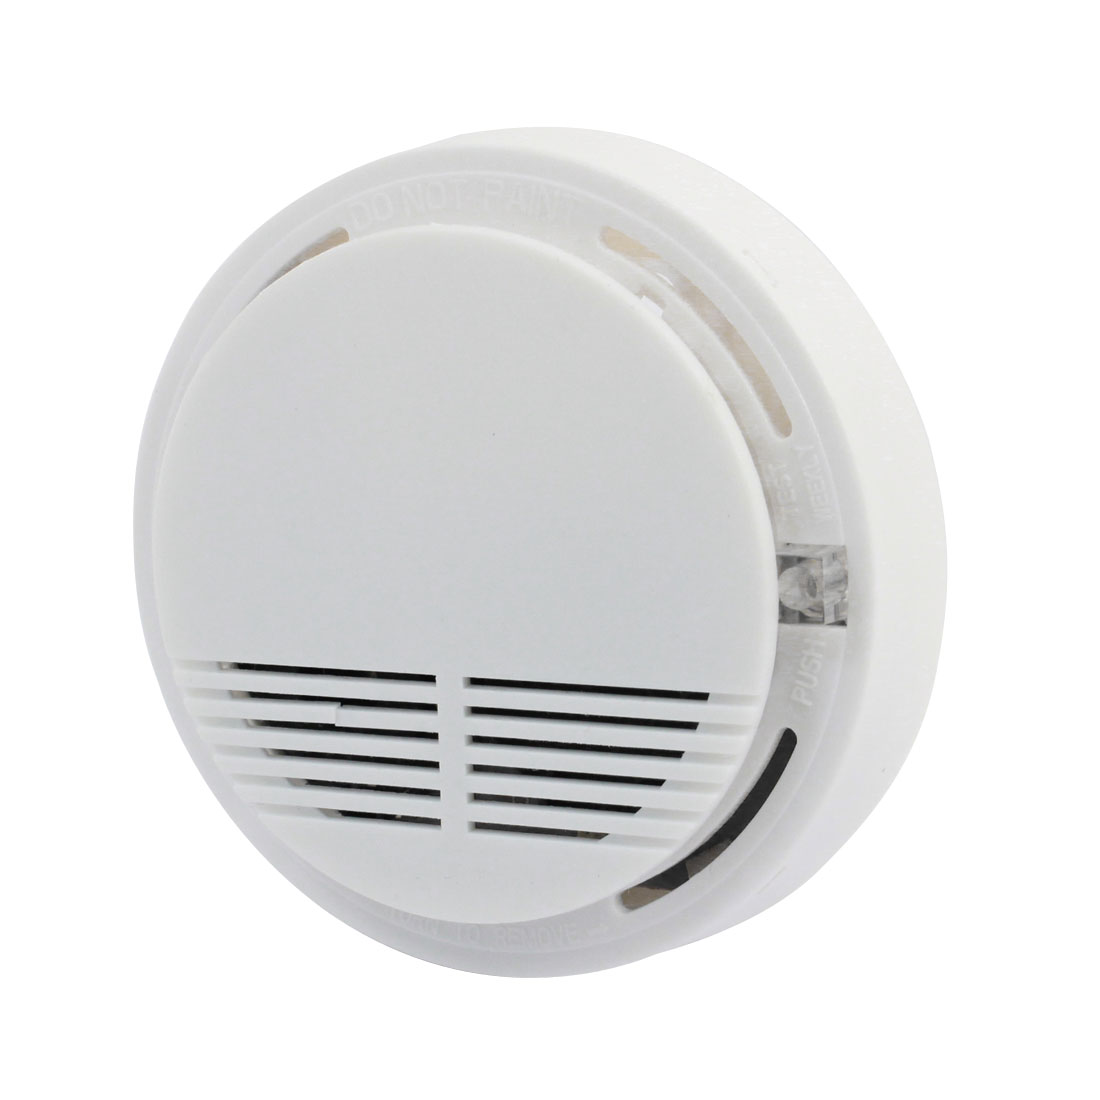 Photoelectric Wireless Smoke Detector Sensor Fire Alarm 10.5cm x 3cm